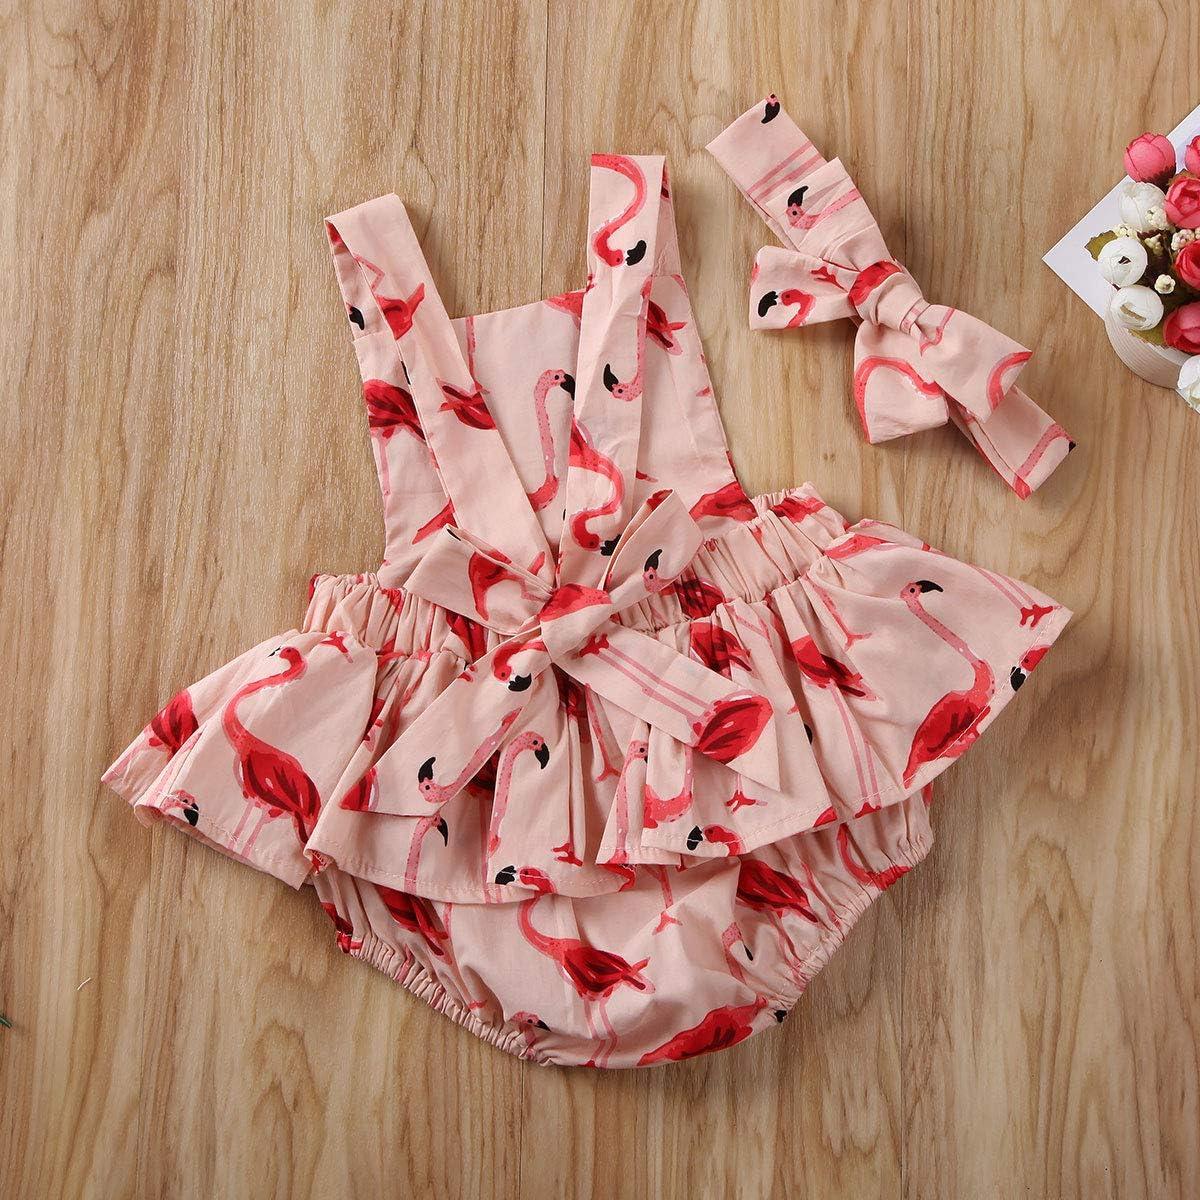 Muasaaluxi Newborn Baby Girls Flamingo Sleeveless Romper Backless Bodysuit Jumpsuit Headband Summer Outfits 0-24M